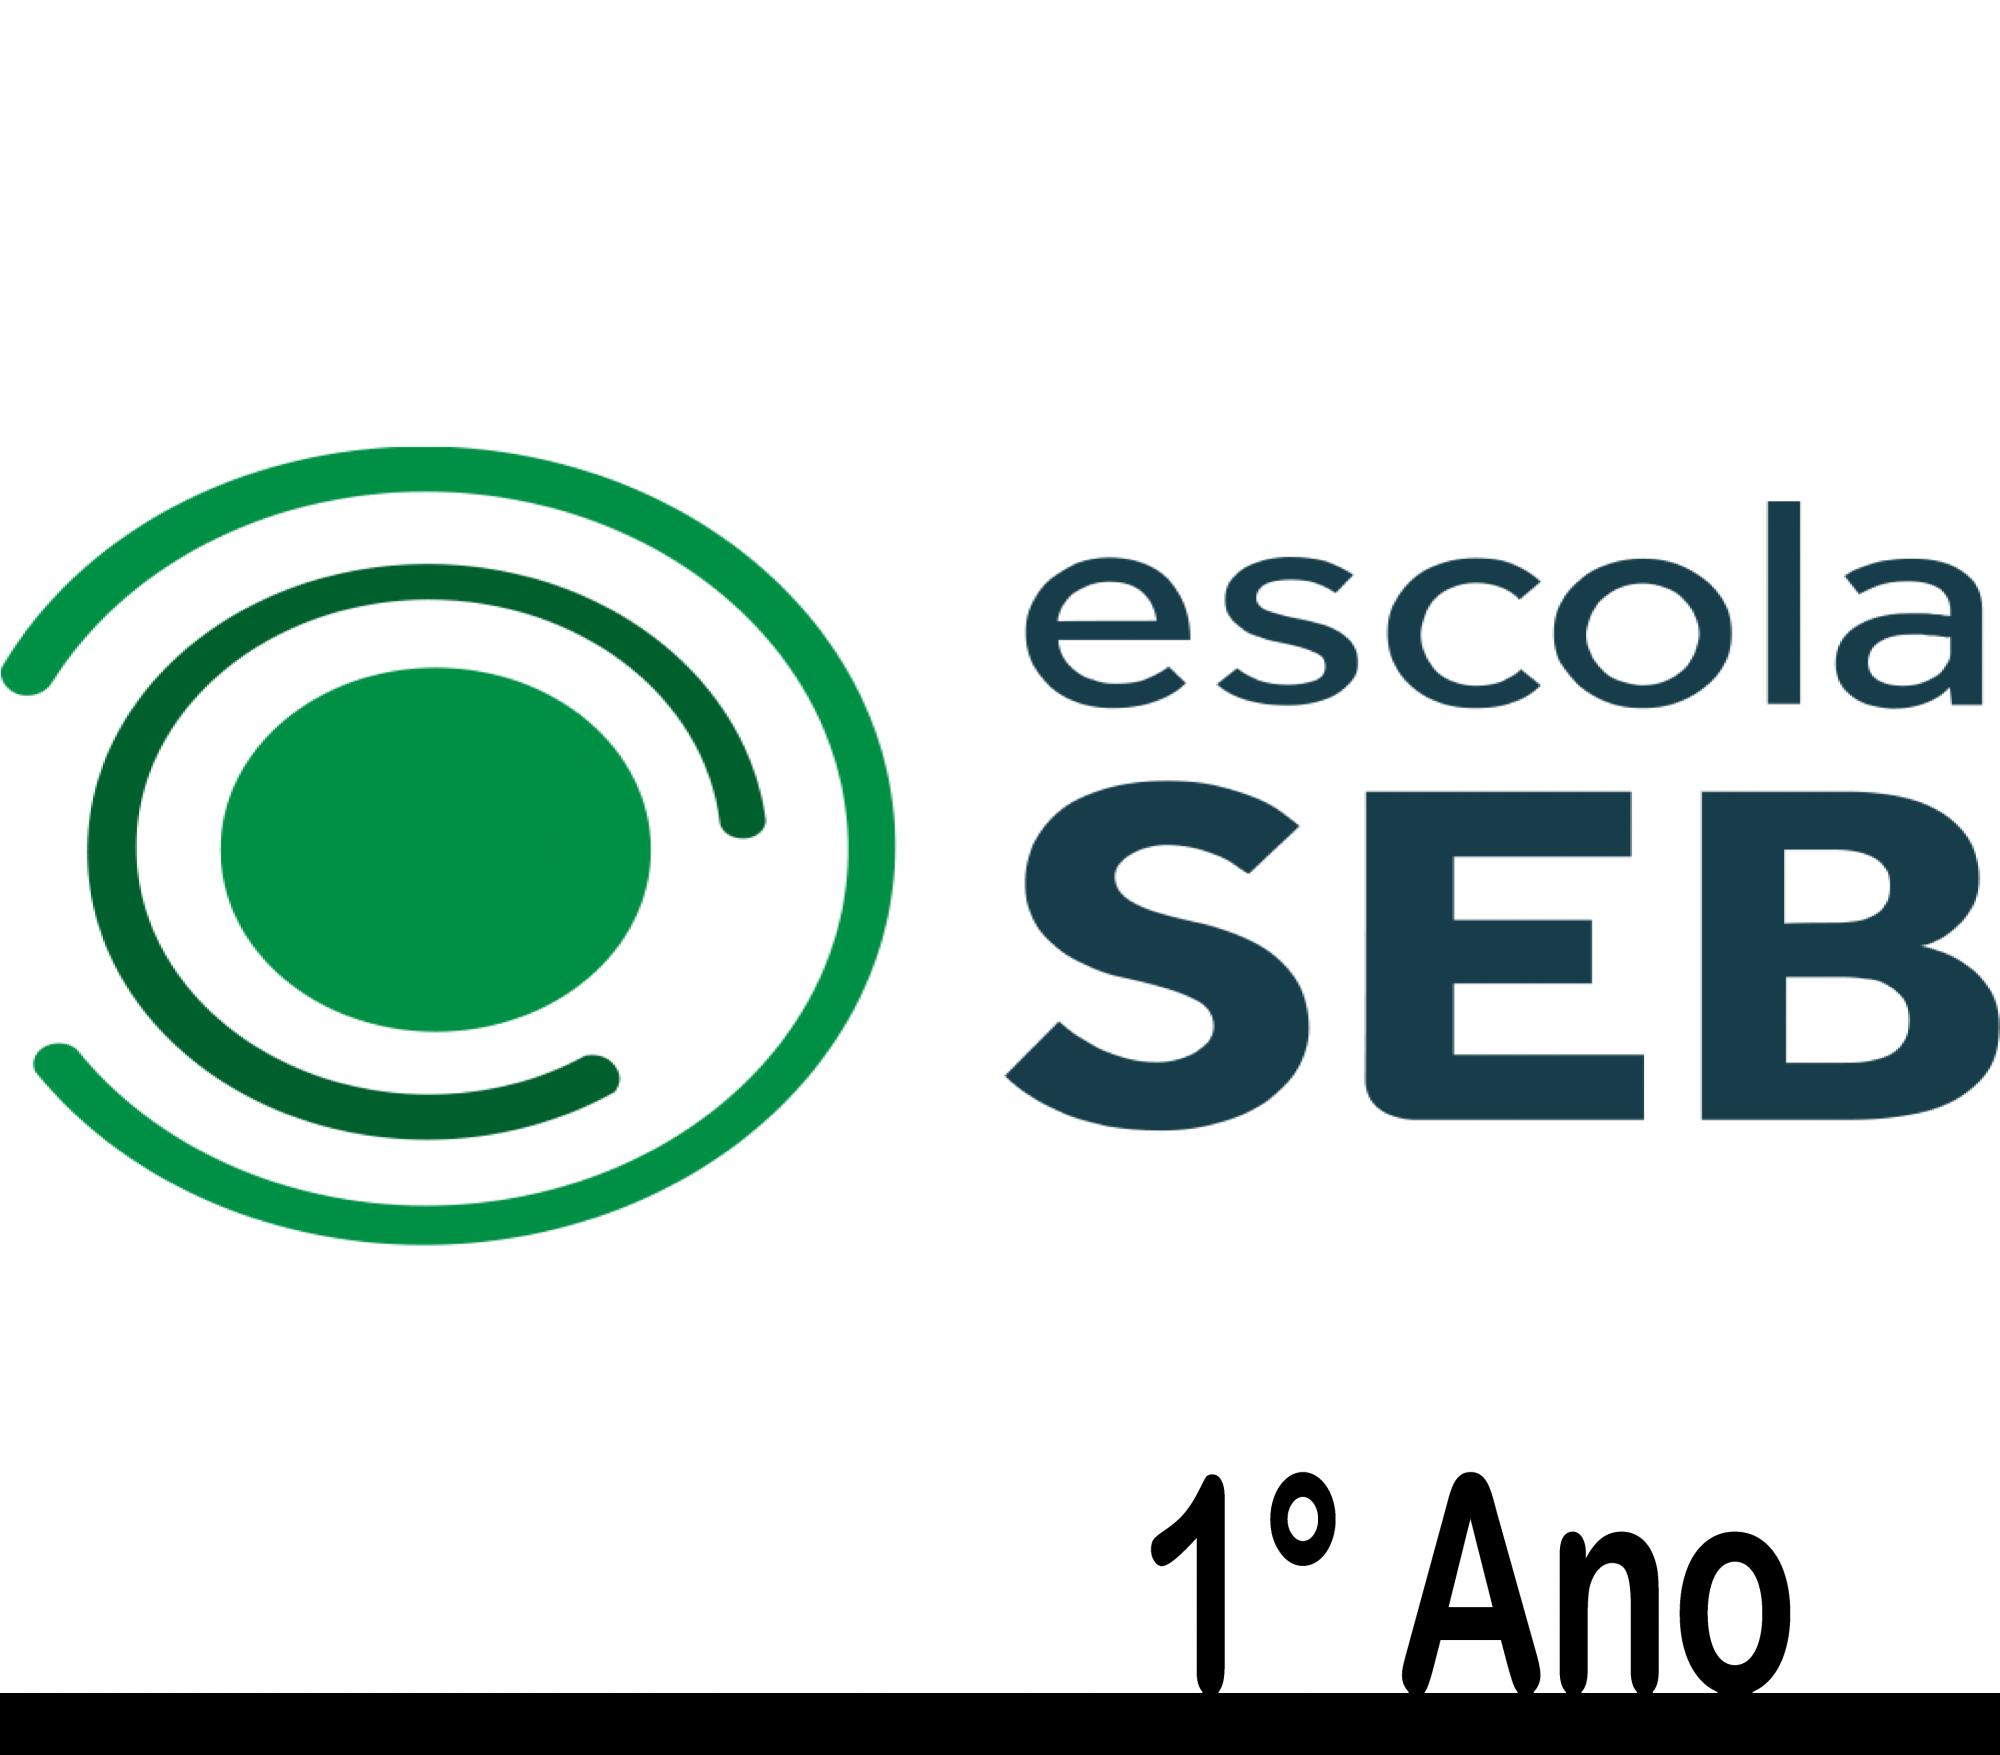 Seb Coc - 1° Ano uso pessoal Faber-Castell - 2021